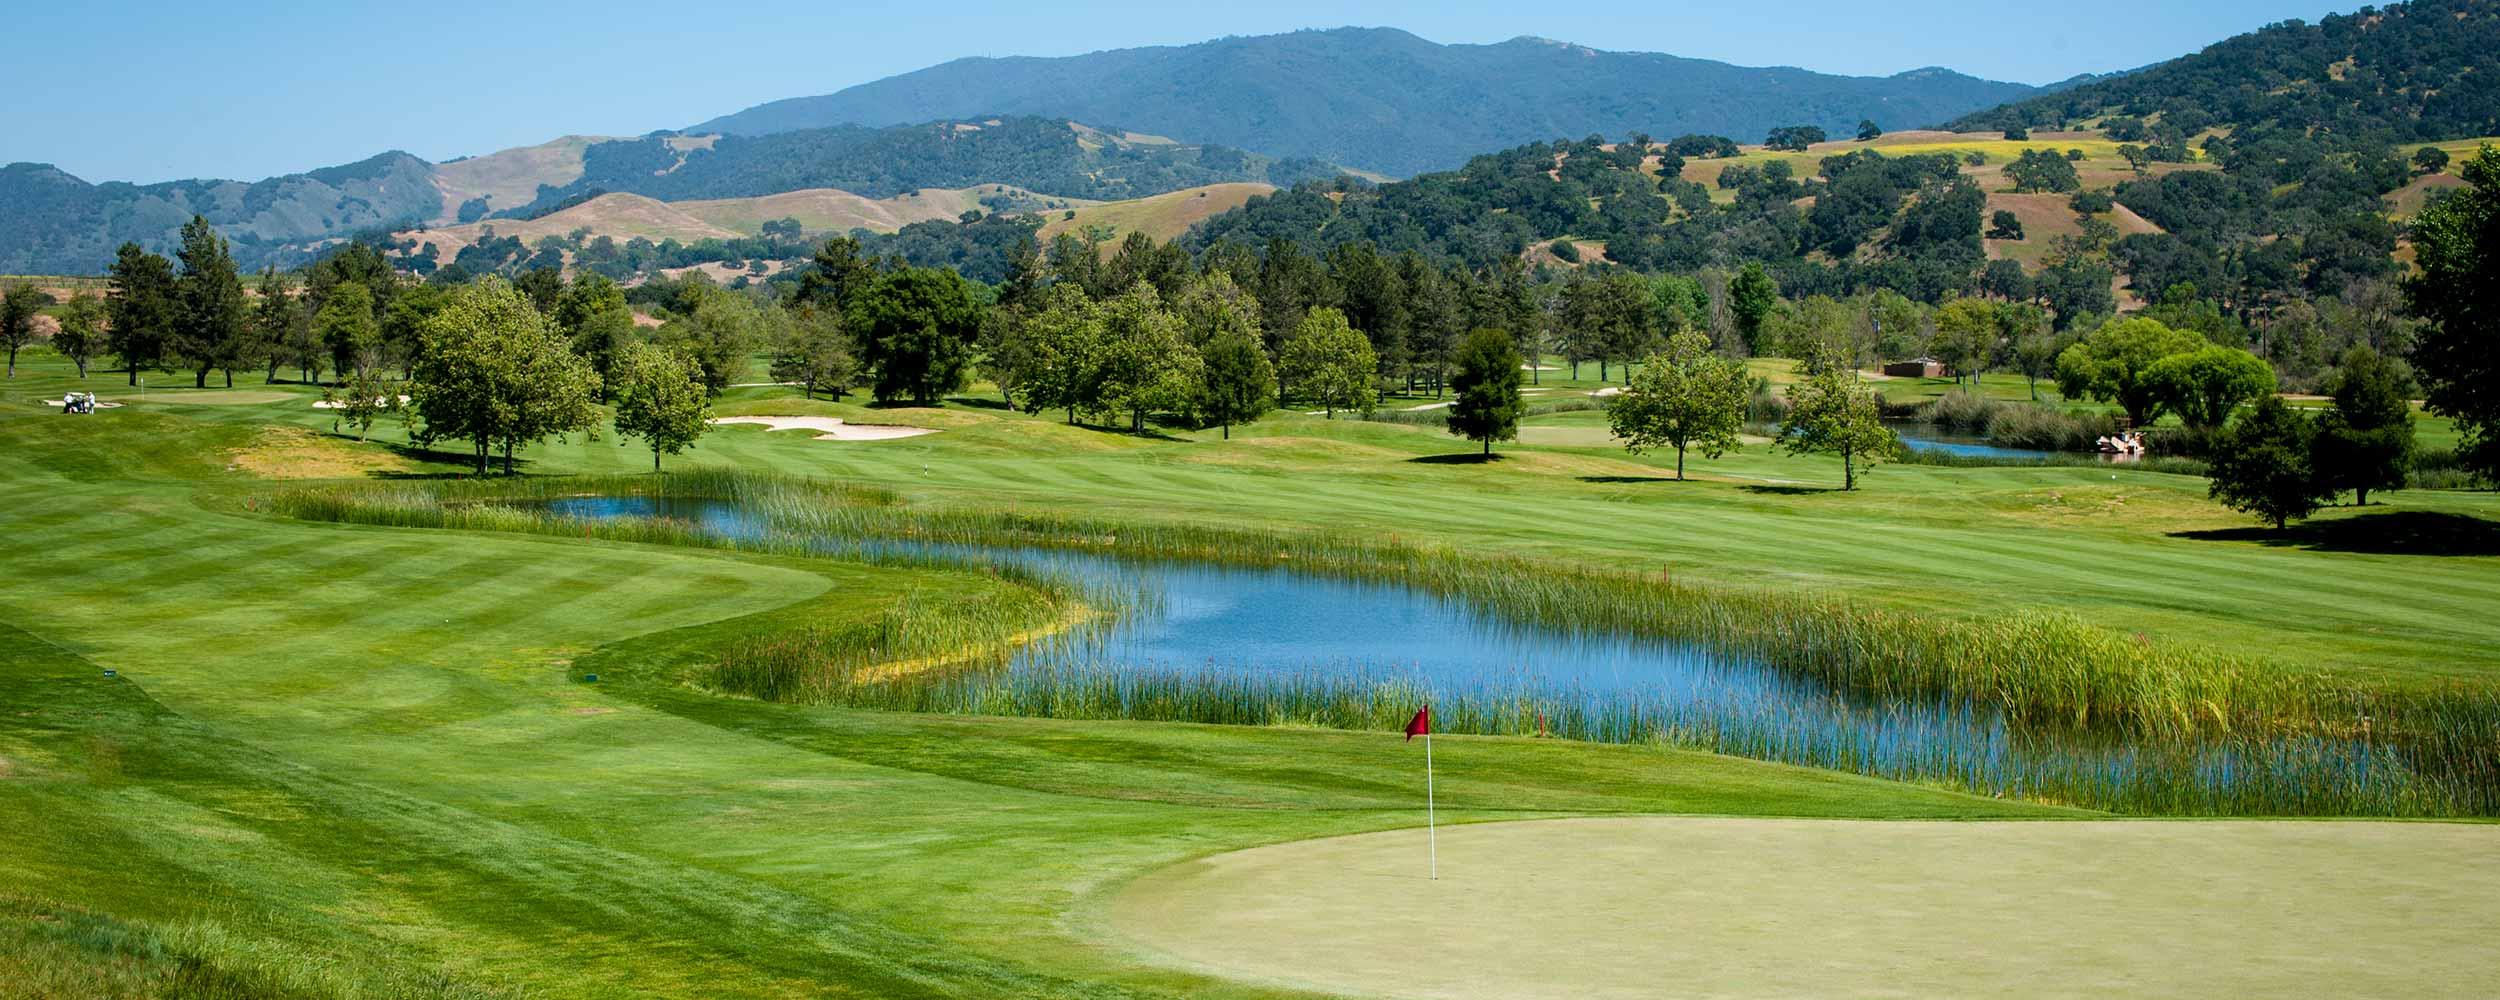 golfing the Alisal River Course - Alisal Resort in Solvang California